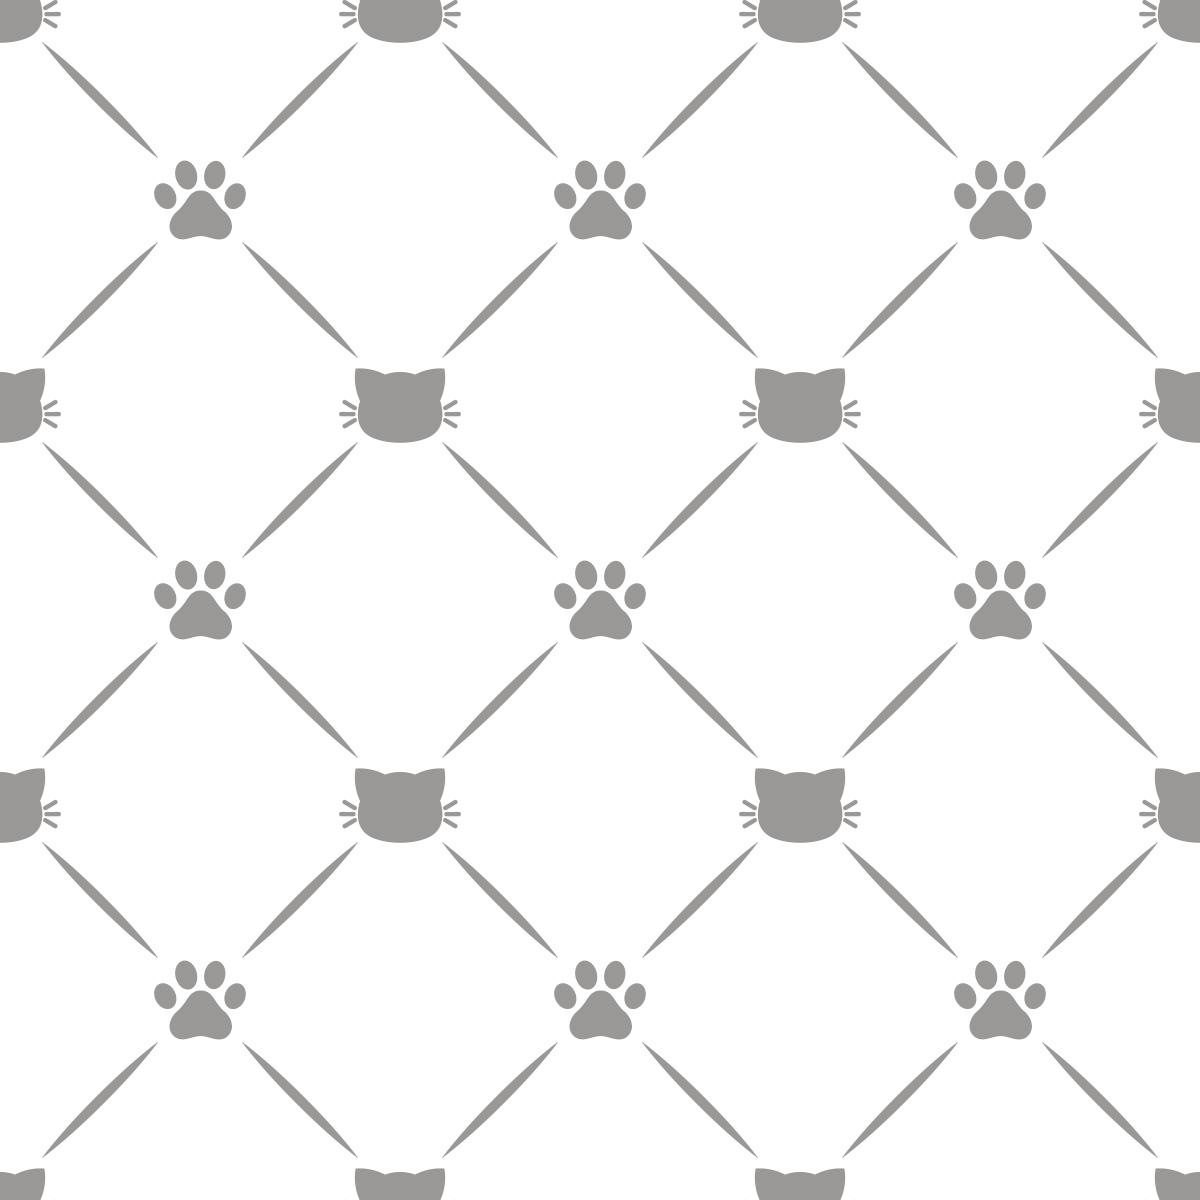 Papel de Parede Pet Shop Patas Pet Gatos Adesivo